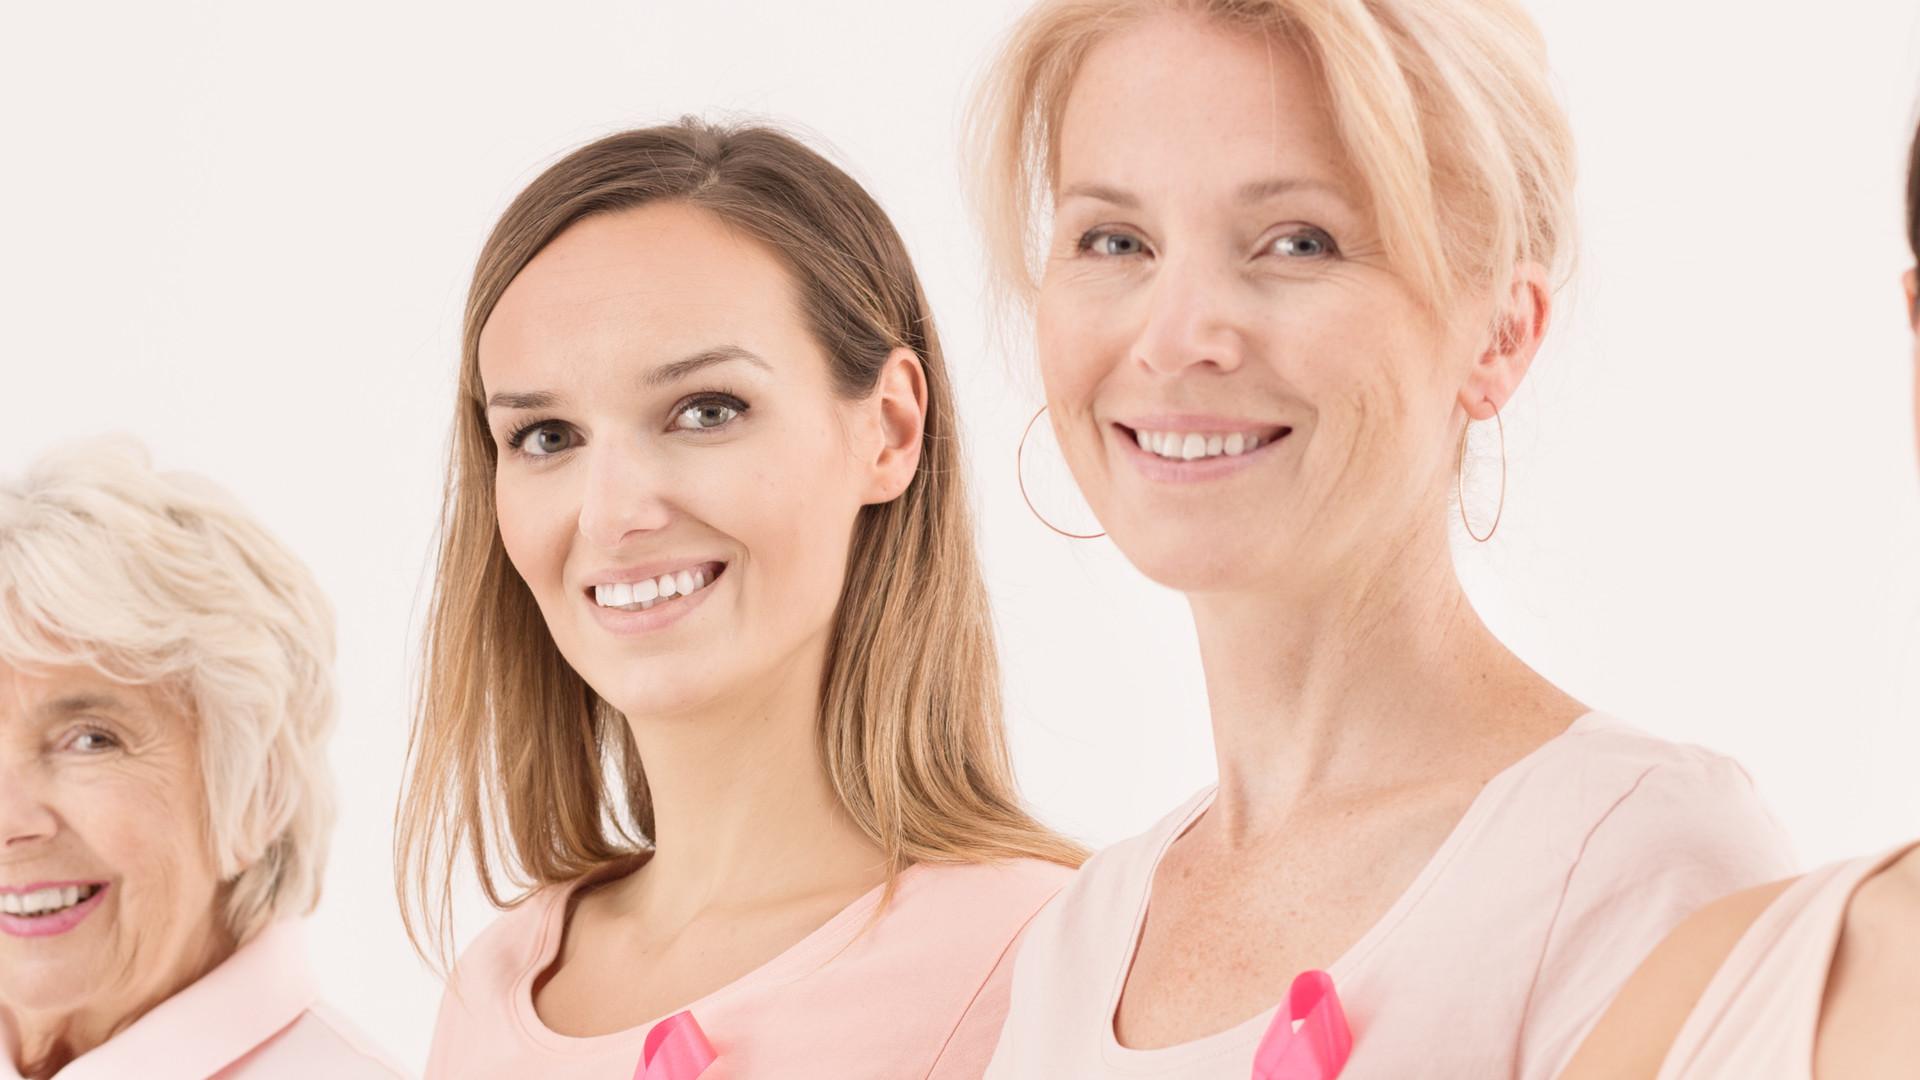 6-Krebsvorsorge-Frauenarzt.jpeg